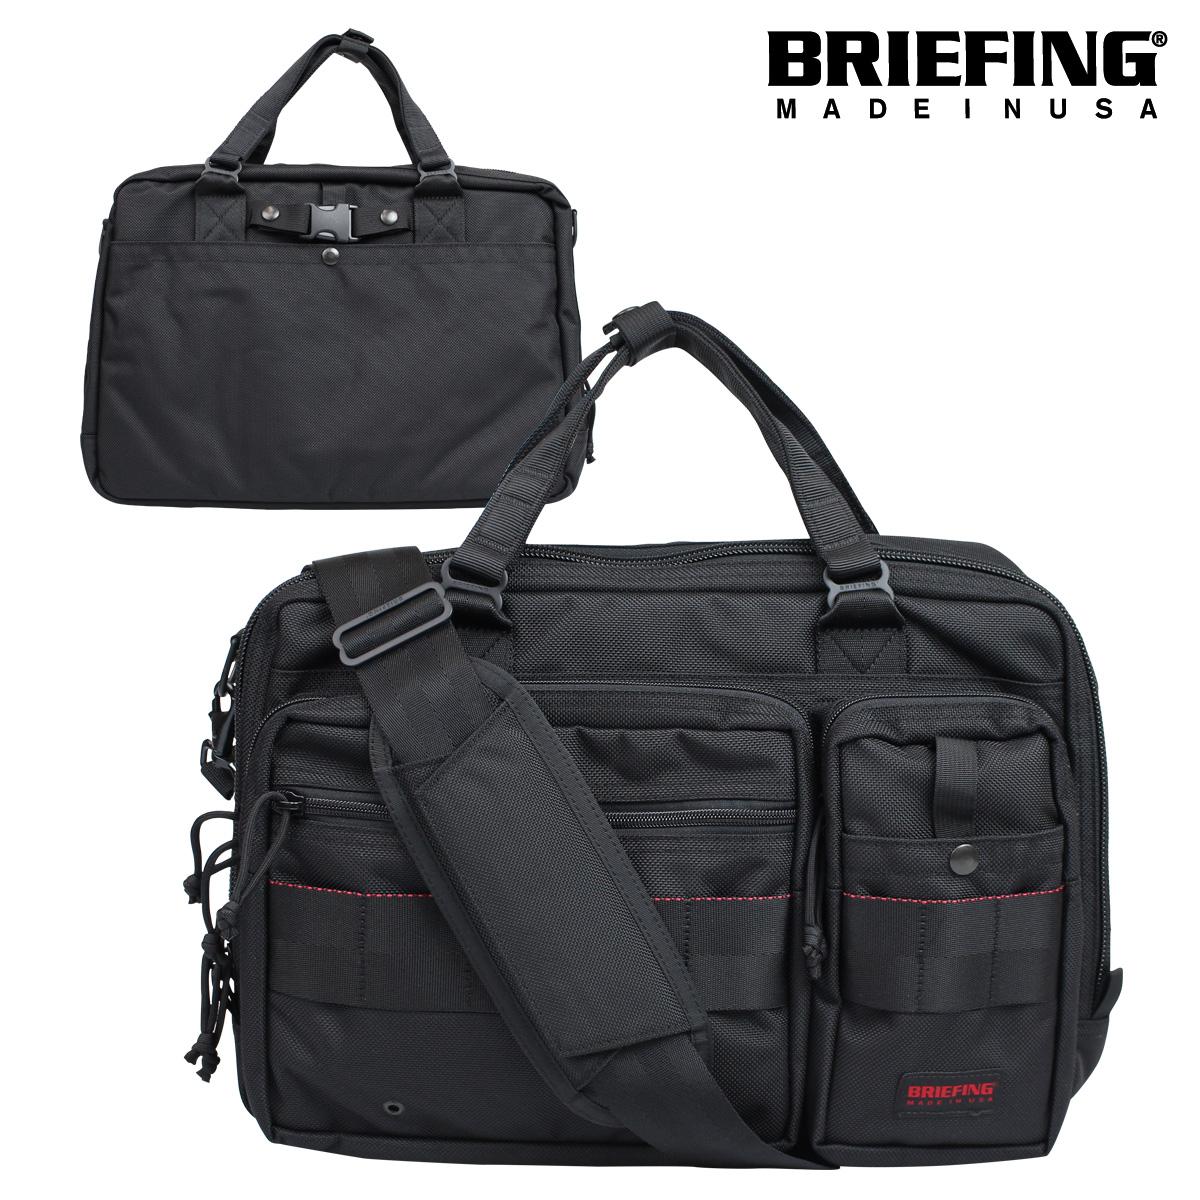 BRIEFING ブリーフィング ビジネスバッグ ショルダーバッグ BRF174219 A4 LINER メンズ